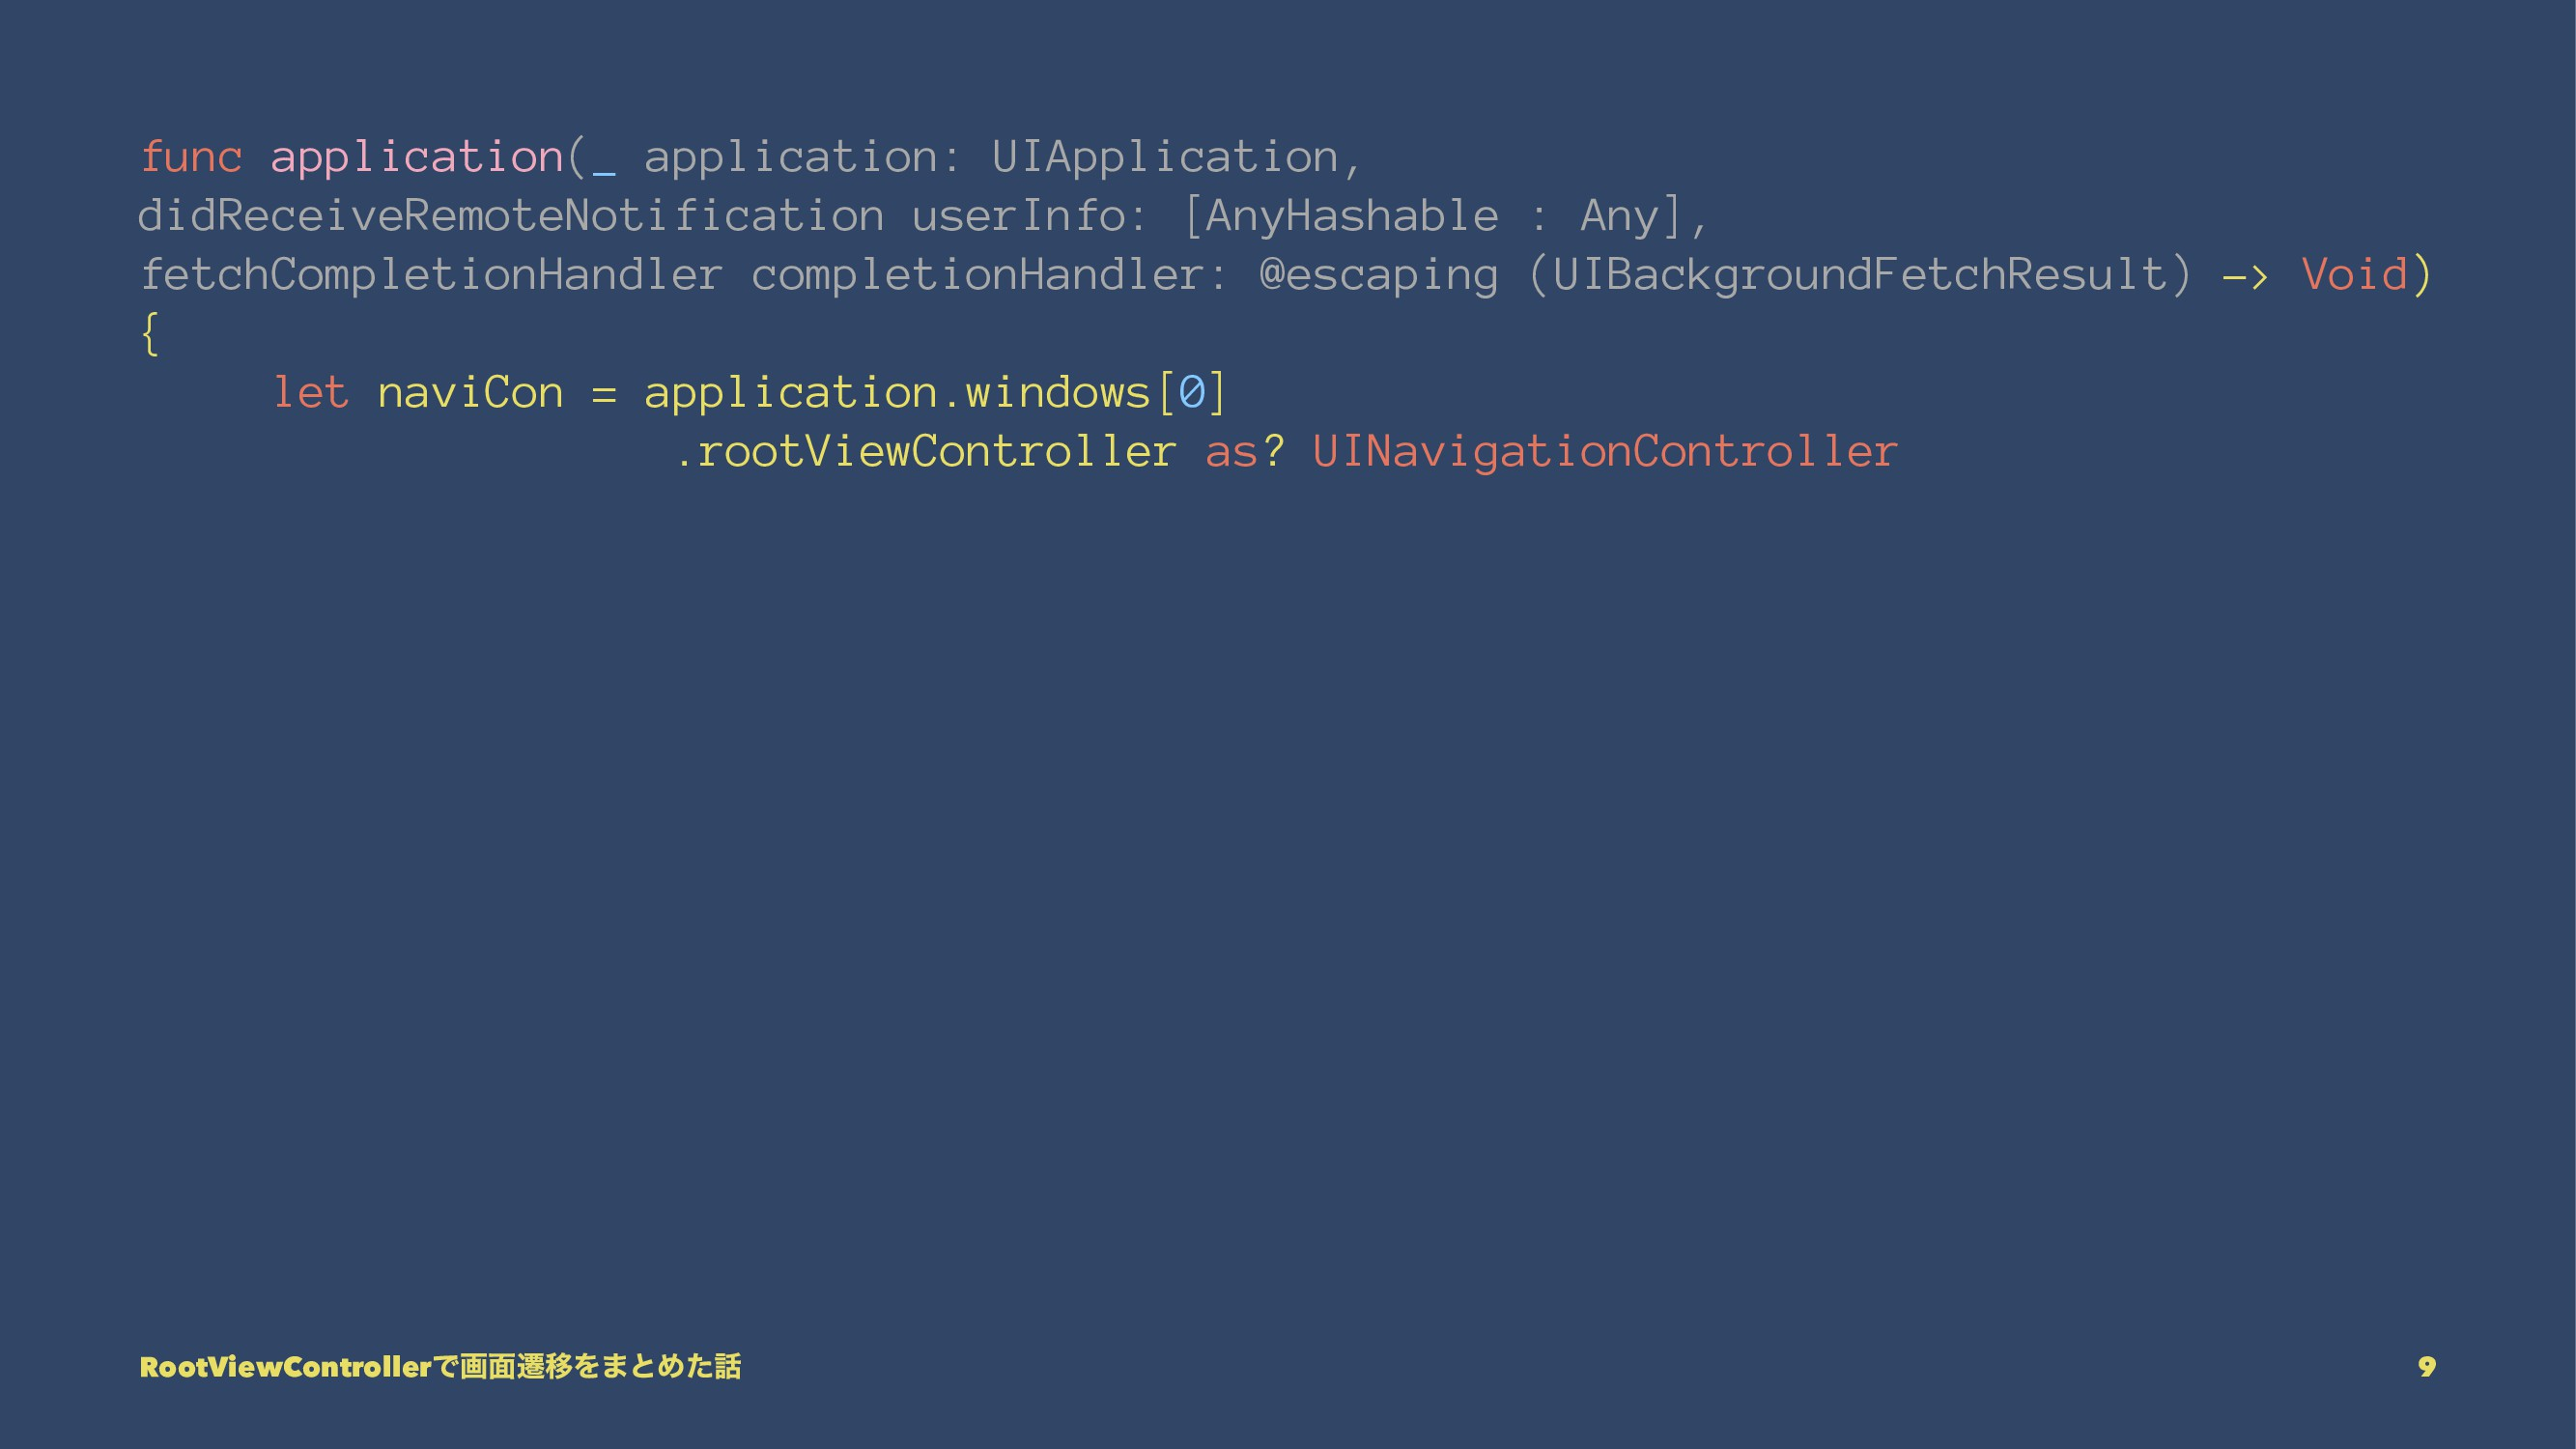 func application(_ application: UIApplication, ...